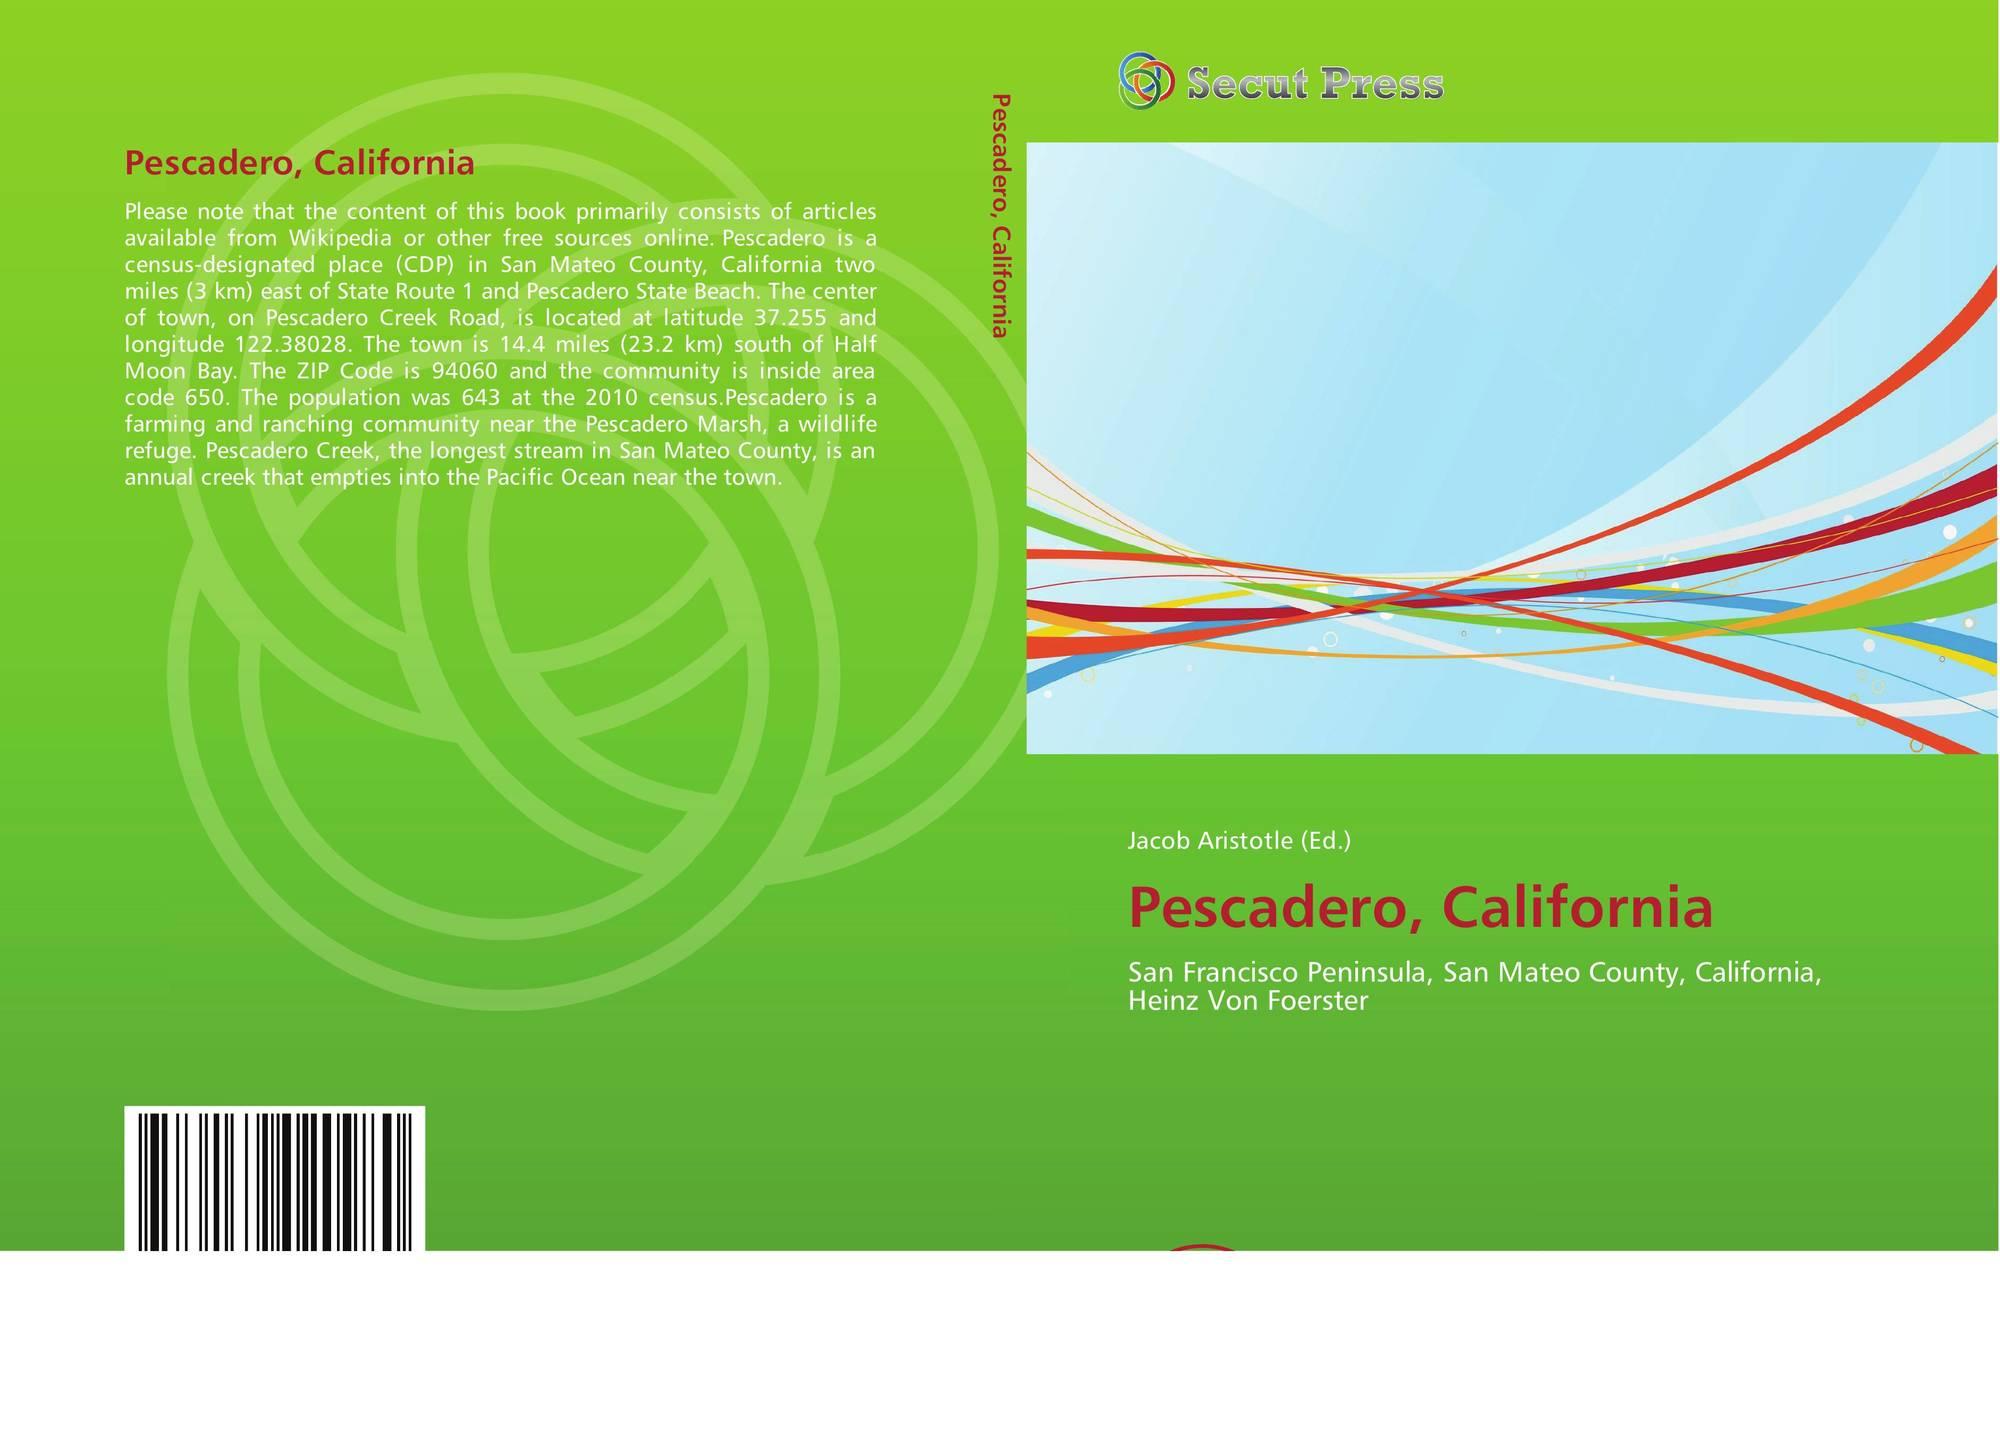 California san mateo county pescadero - Bookcover Of Pescadero California